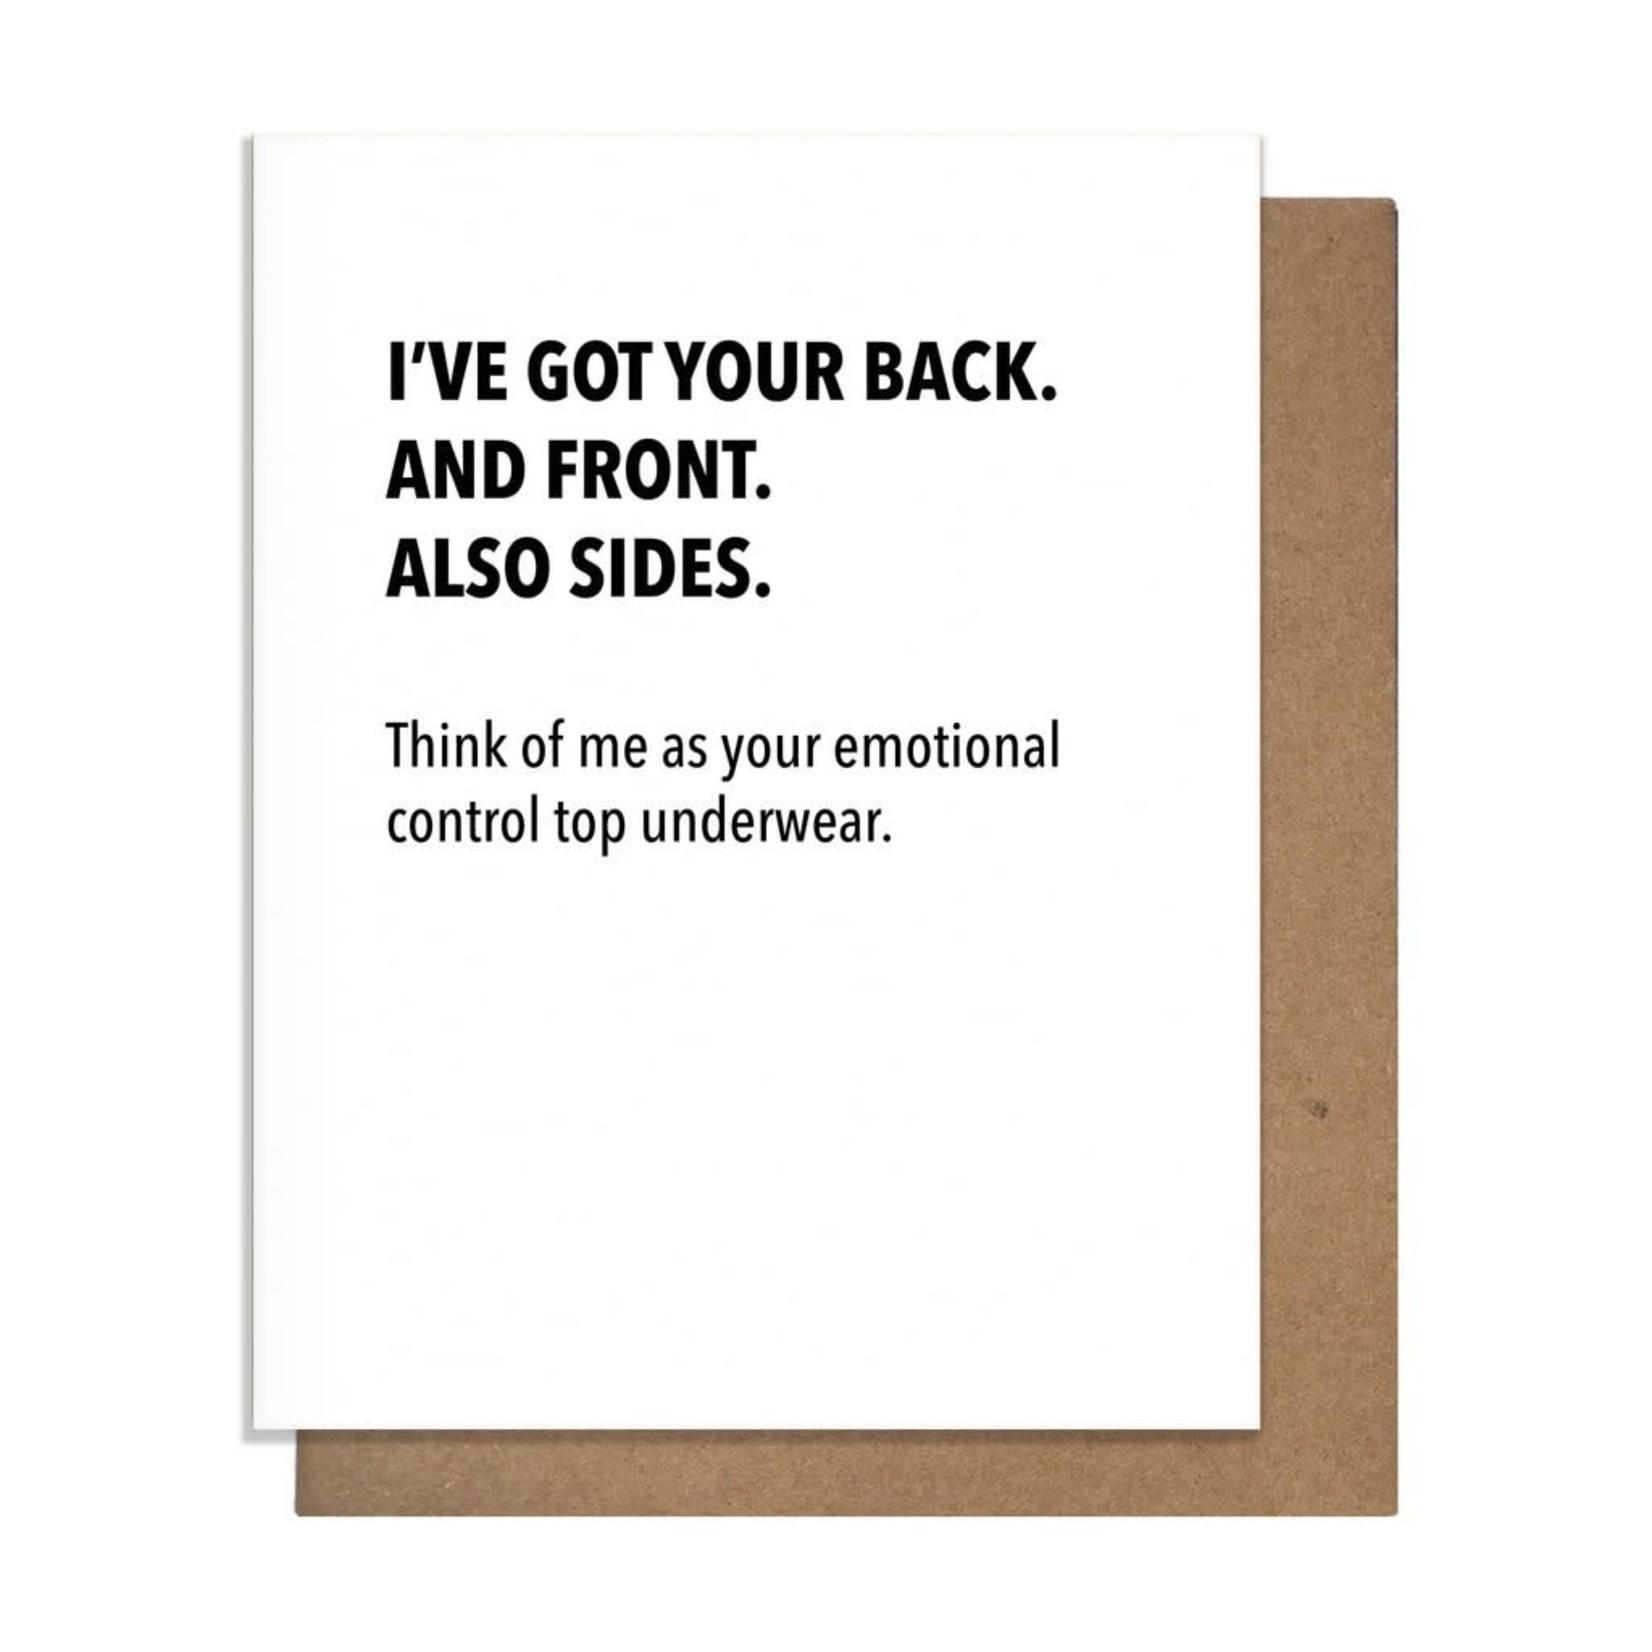 Pretty Alright Goods Card - Emotional Control Top Underwear